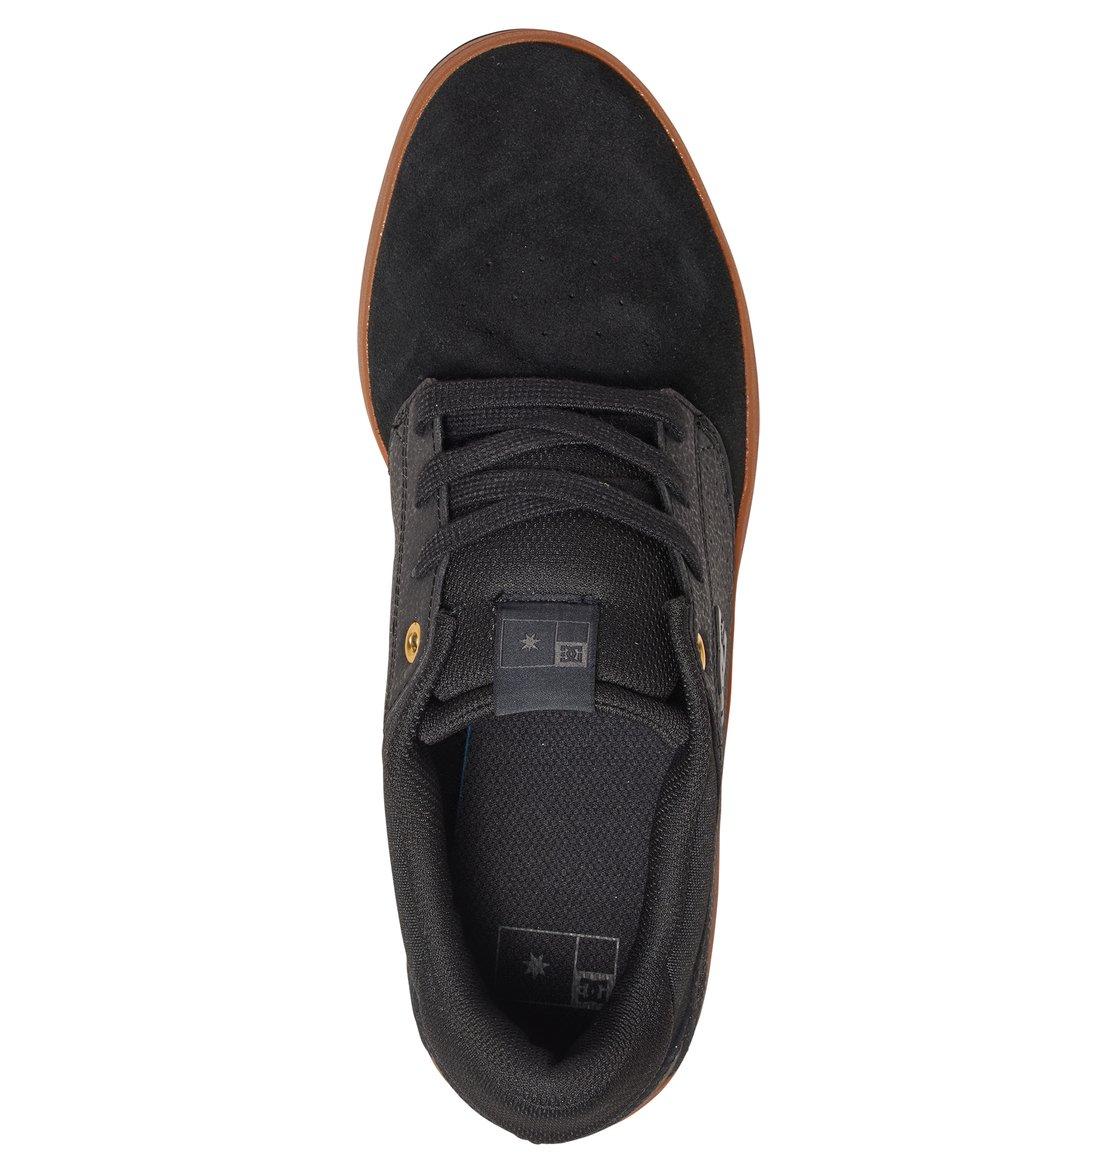 Skate shoes dc - 3 Men S Plaza Tc S Skate Shoes Black Adys100319 Dc Shoes